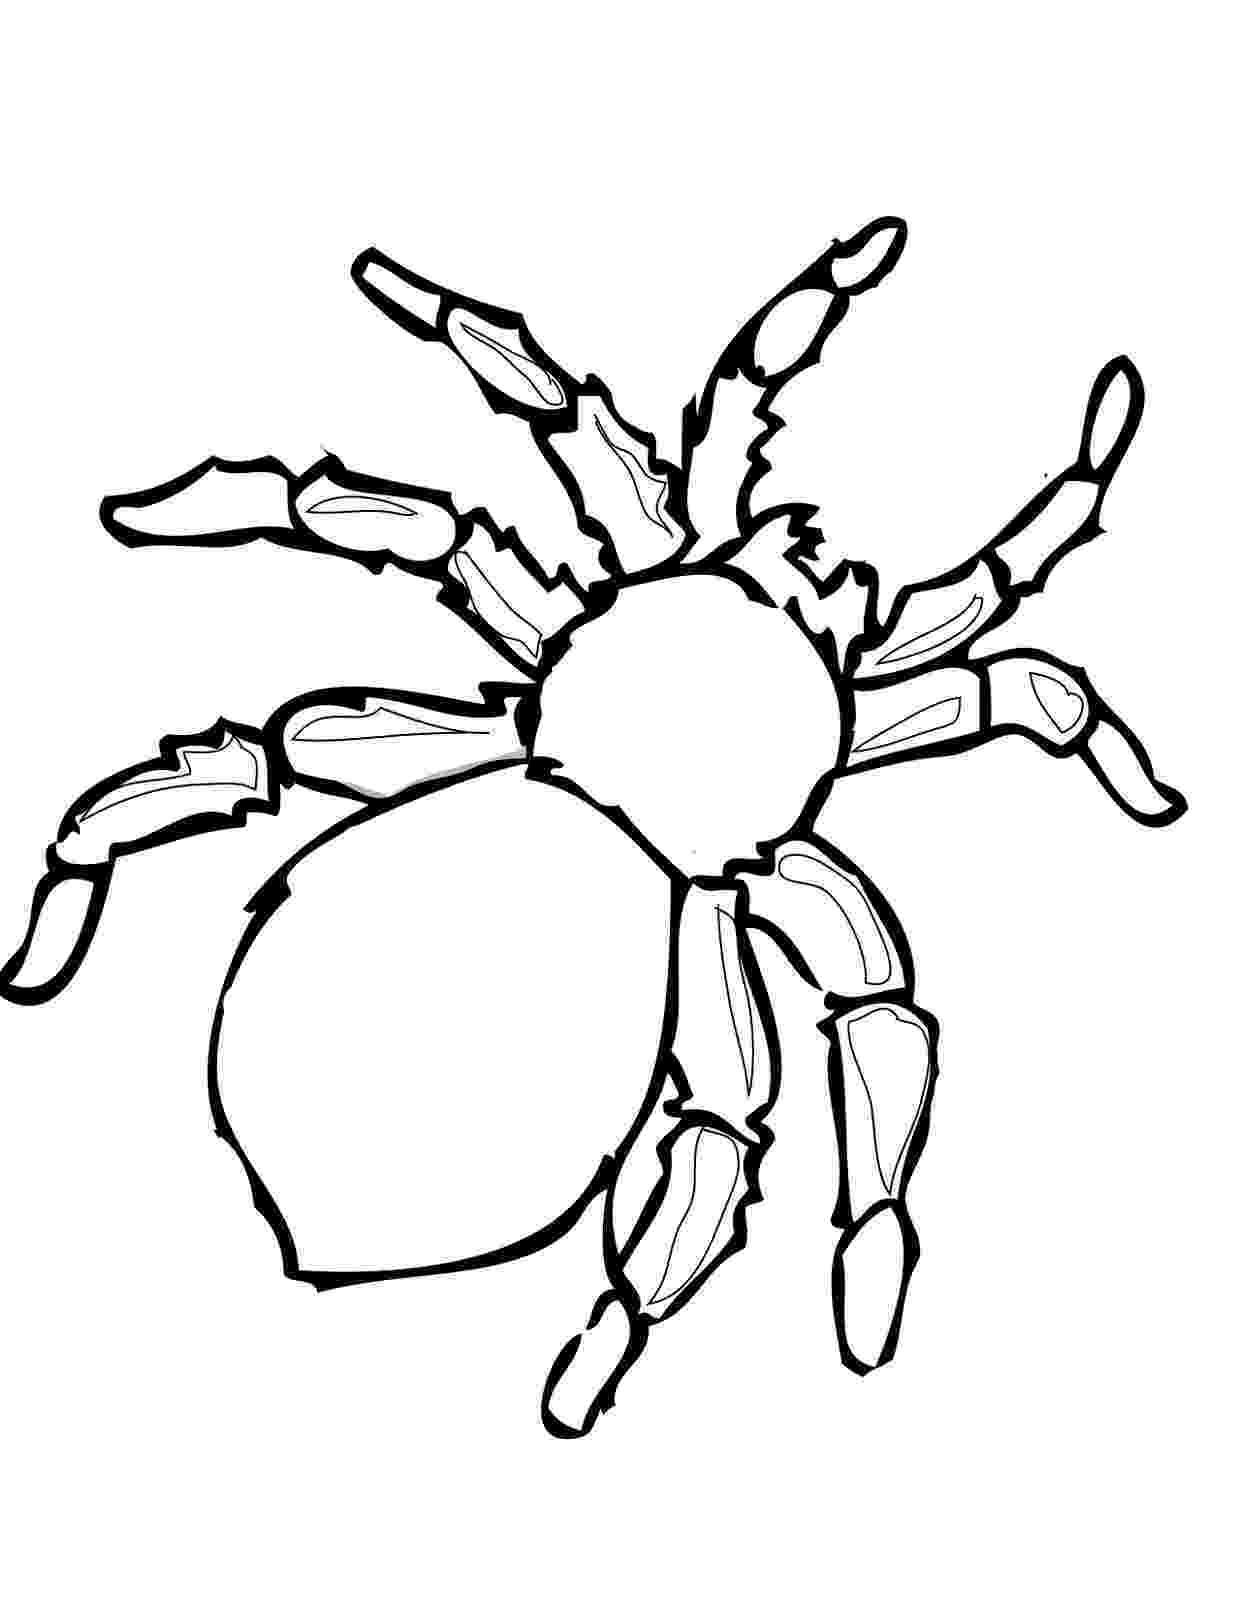 tarantula coloring page goliath tarantula coloring page free printable coloring tarantula page coloring